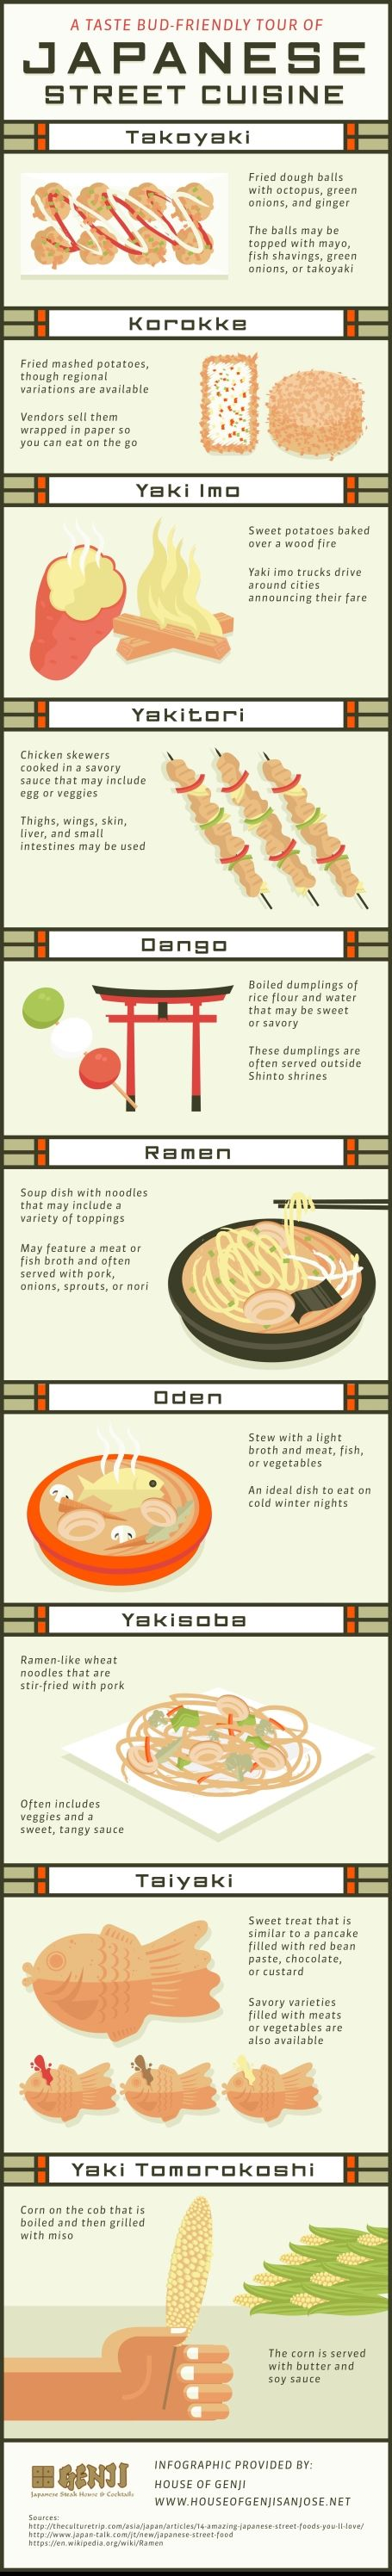 Japanese Street Food: 10 Top Foods Worth Knowing